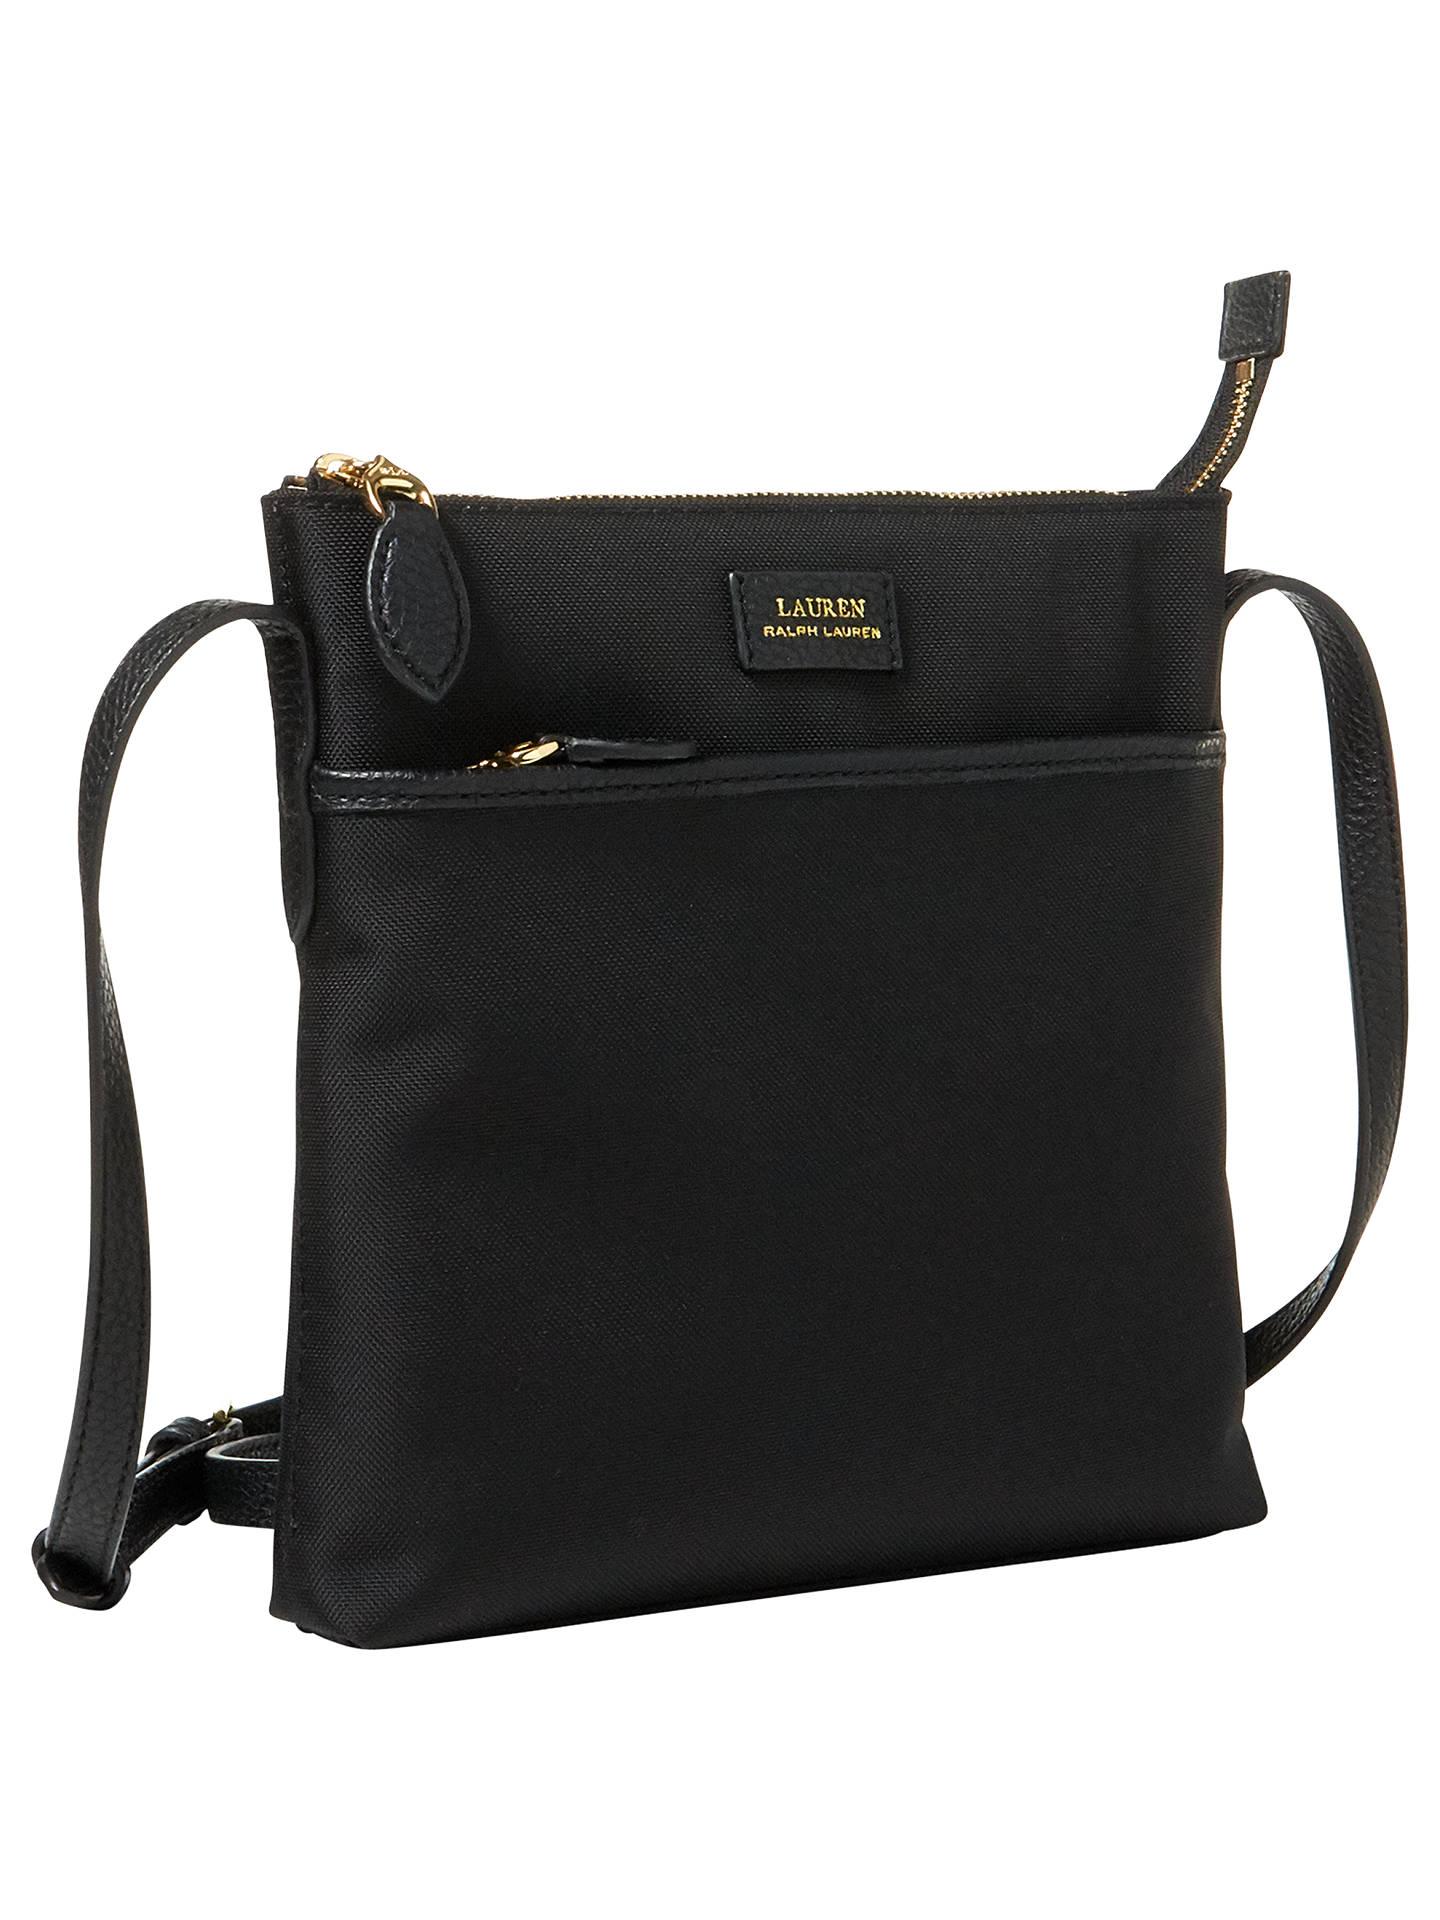 44ce15487a4 ... BuyLauren Ralph Lauren Cross Body Bag, Black, One Size Online at  johnlewis.com ...